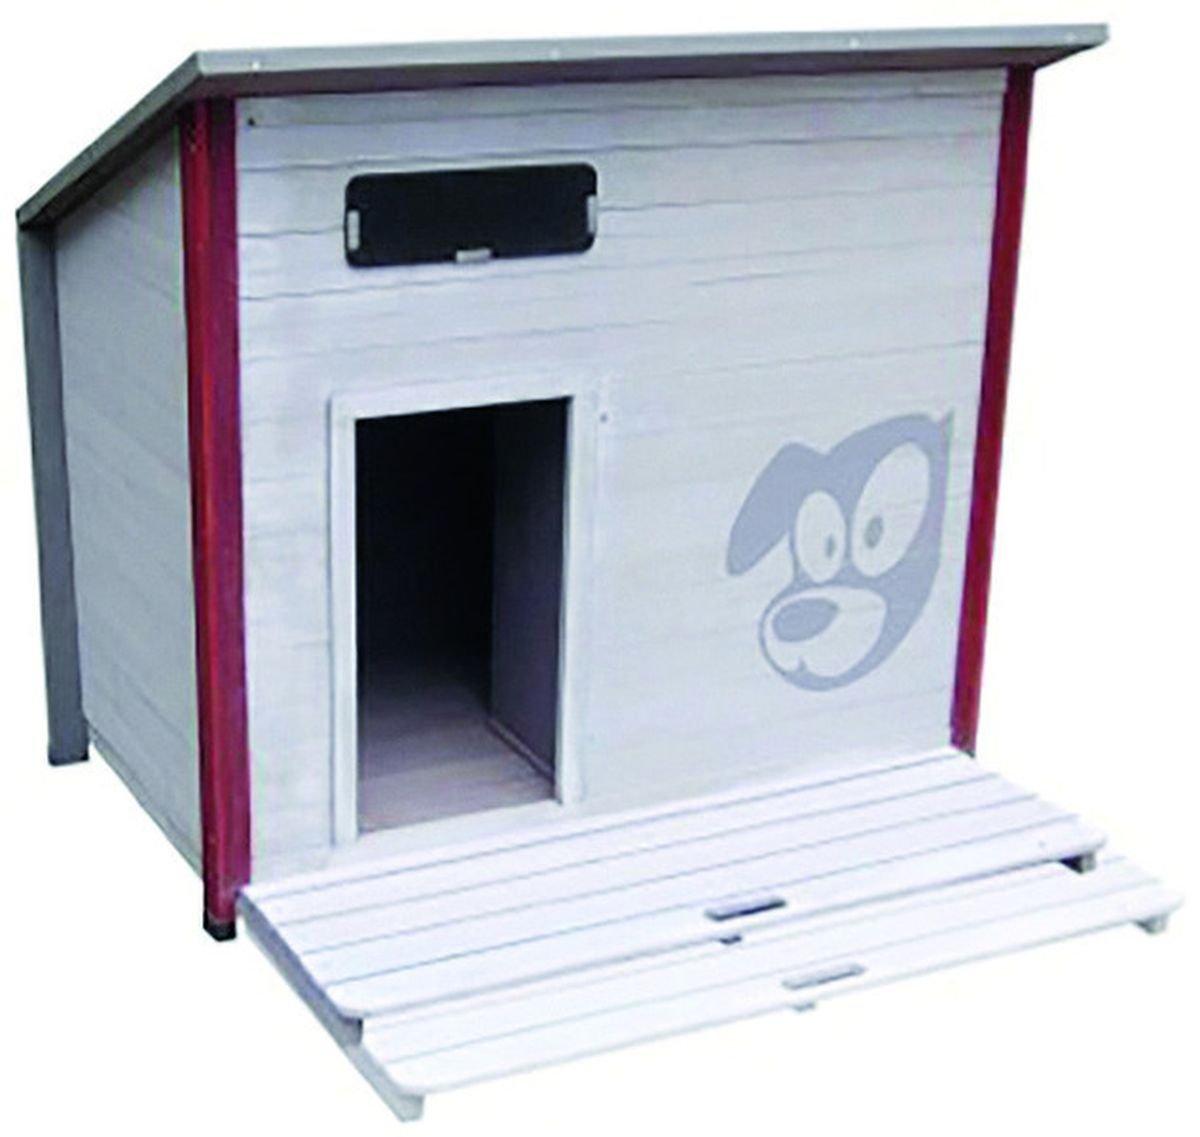 Karlie Flamingo 1030461 Hundehütte, 114 x 110 x 103 cm